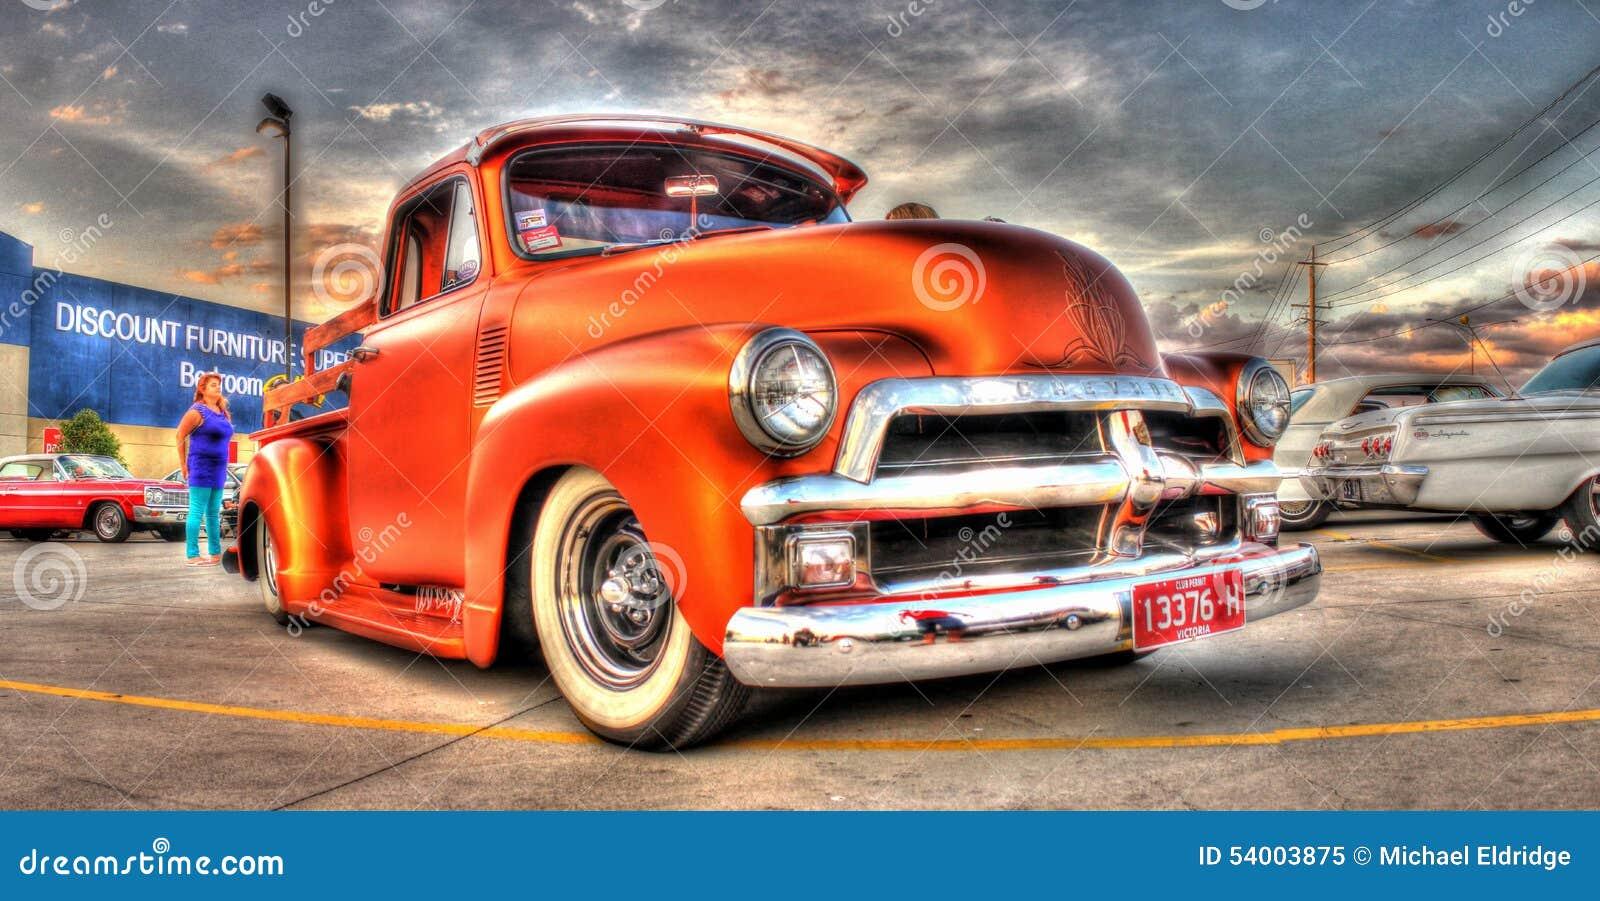 Custom Car Painting Melbourne